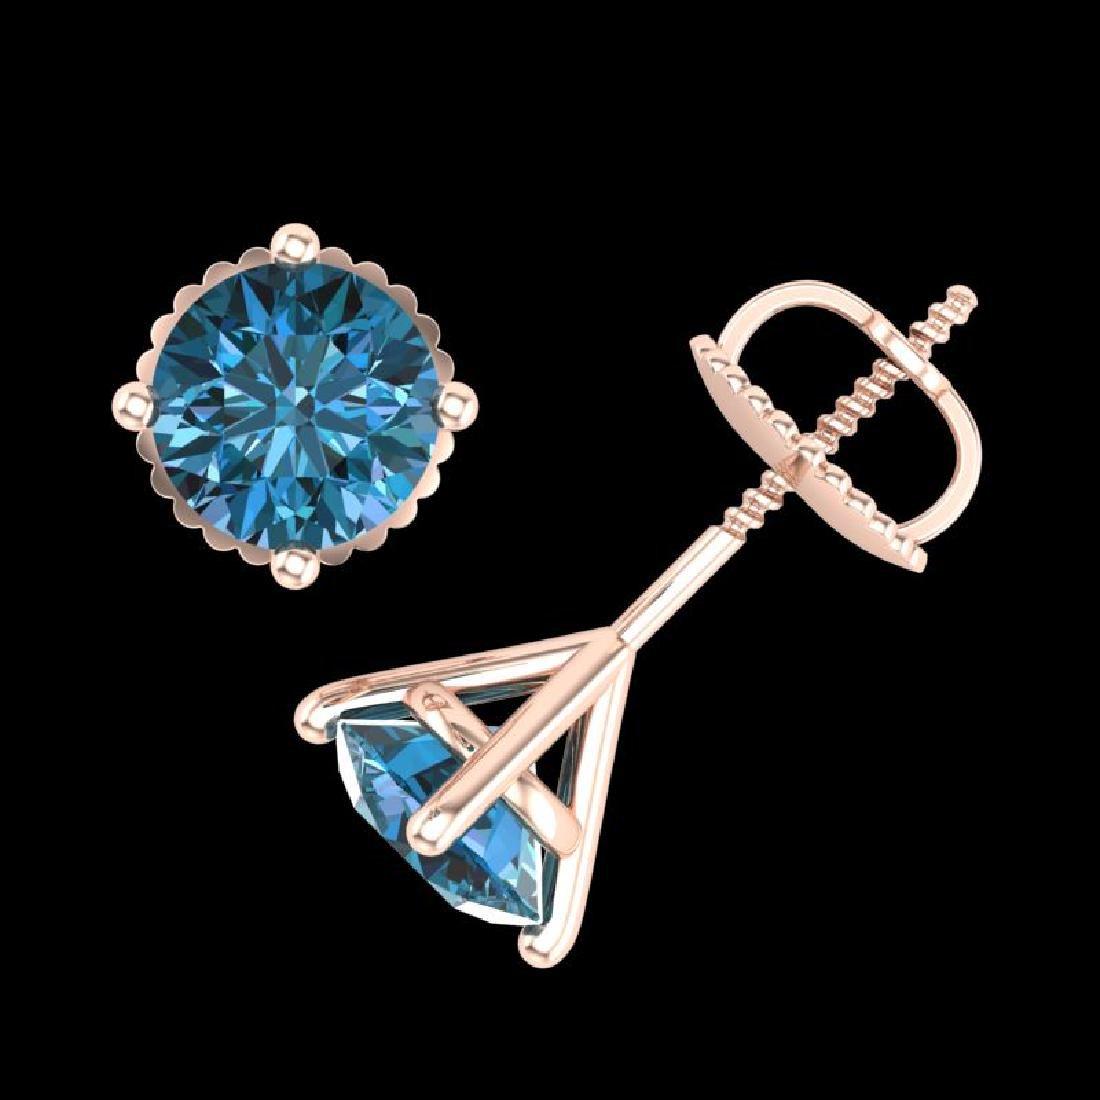 1.5 CTW Fancy Intense Blue Diamond Art Deco Stud - 3